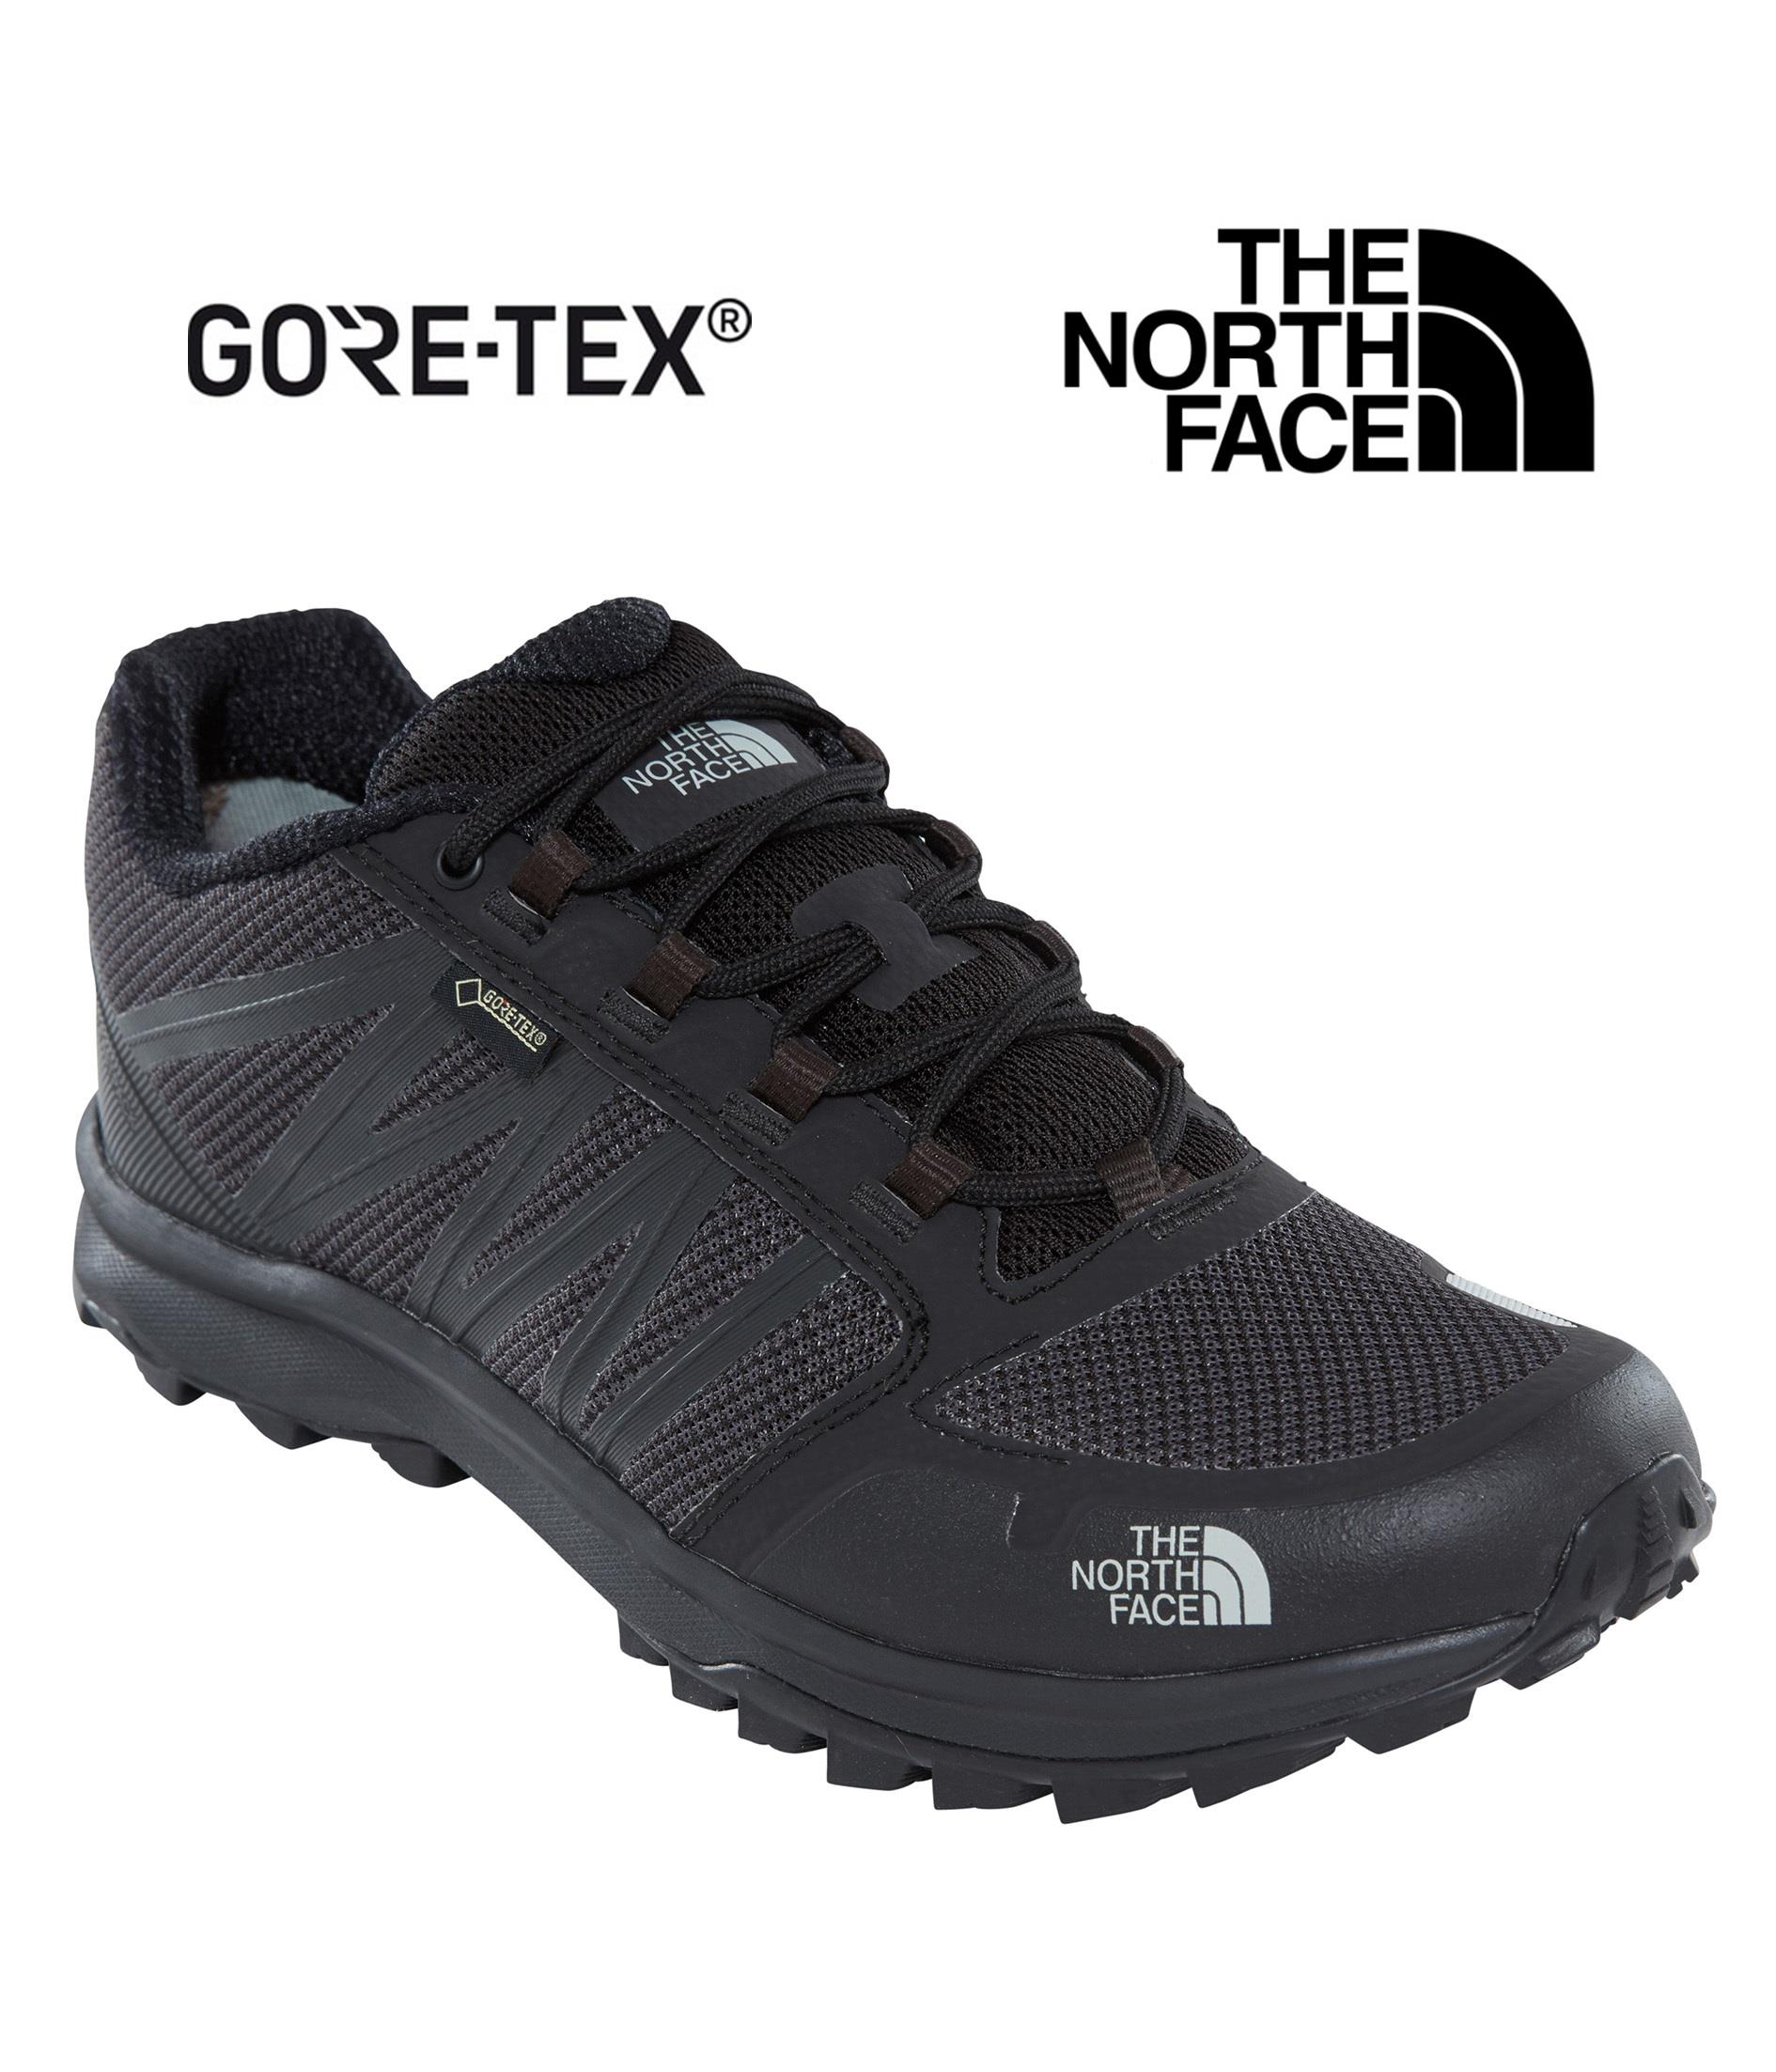 The North Face Litewave Fastpack GTX Erkek Ayakkabı T93Fx4C4V